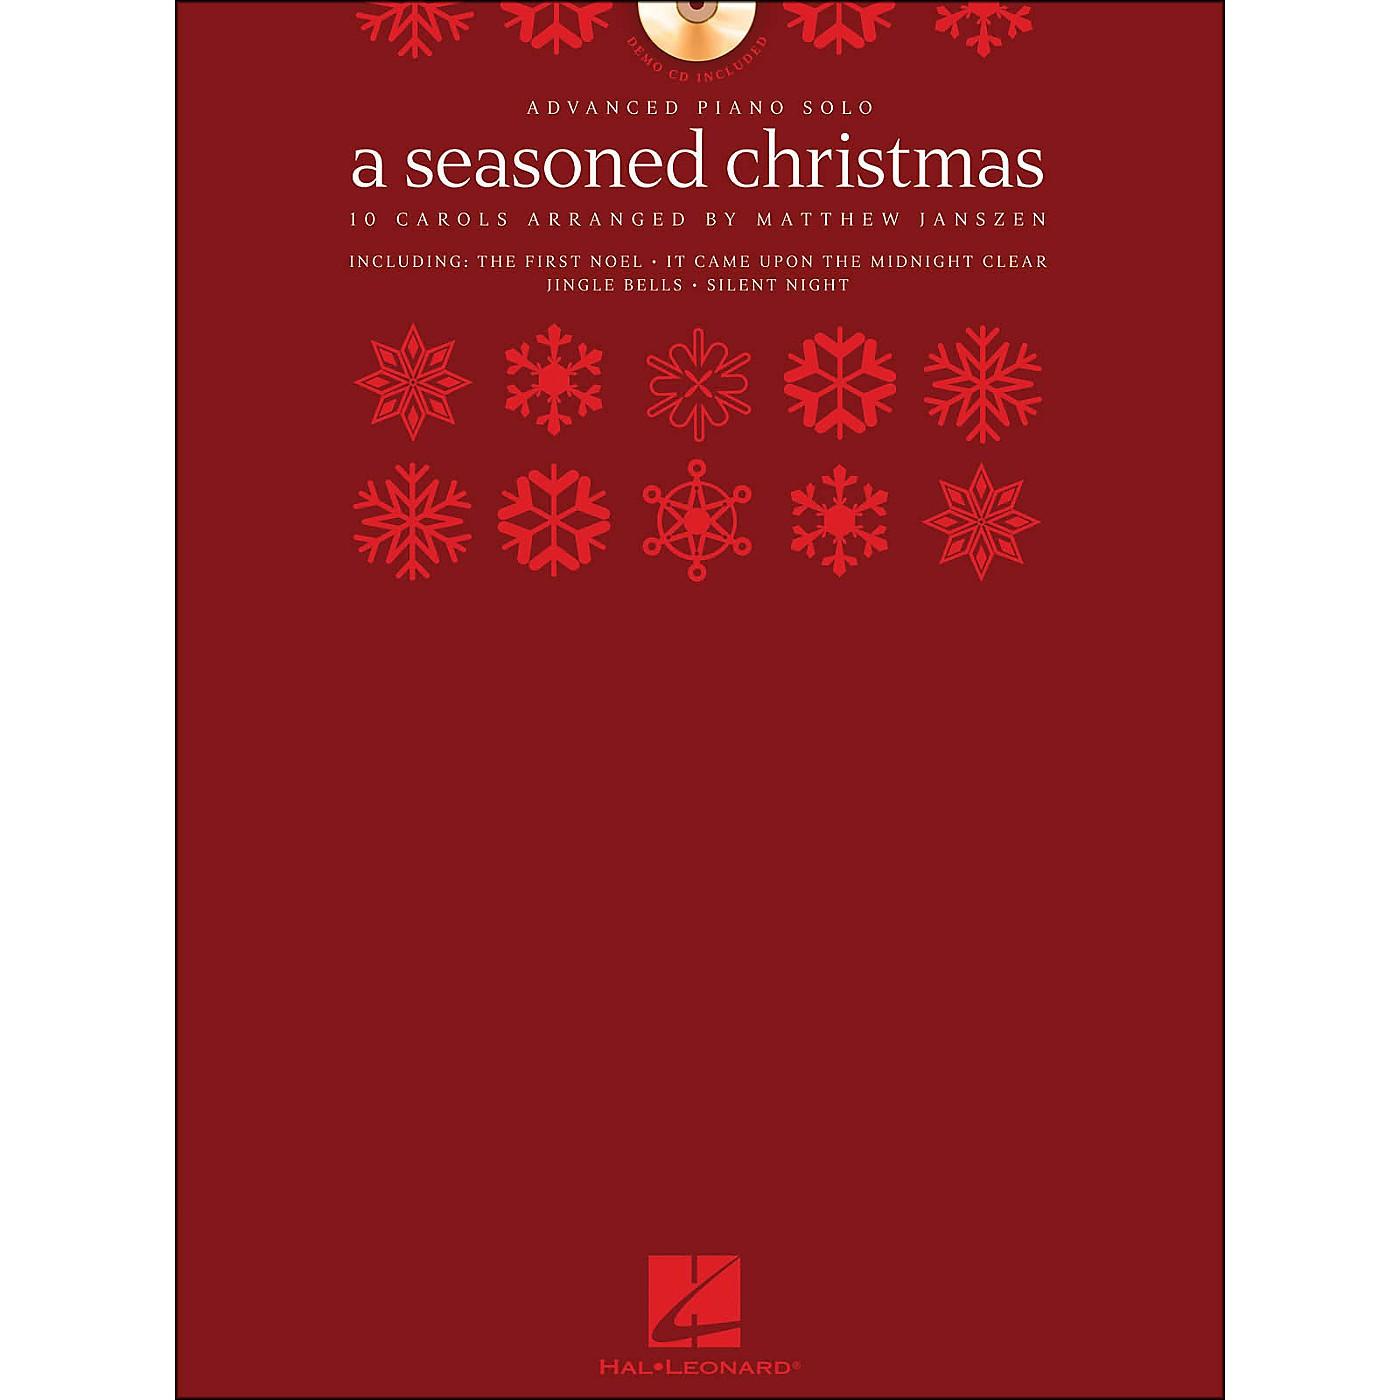 Hal Leonard A Seasoned Christmas - Advanced Piano Solo (Book/CD Pack) arranged for piano solo thumbnail